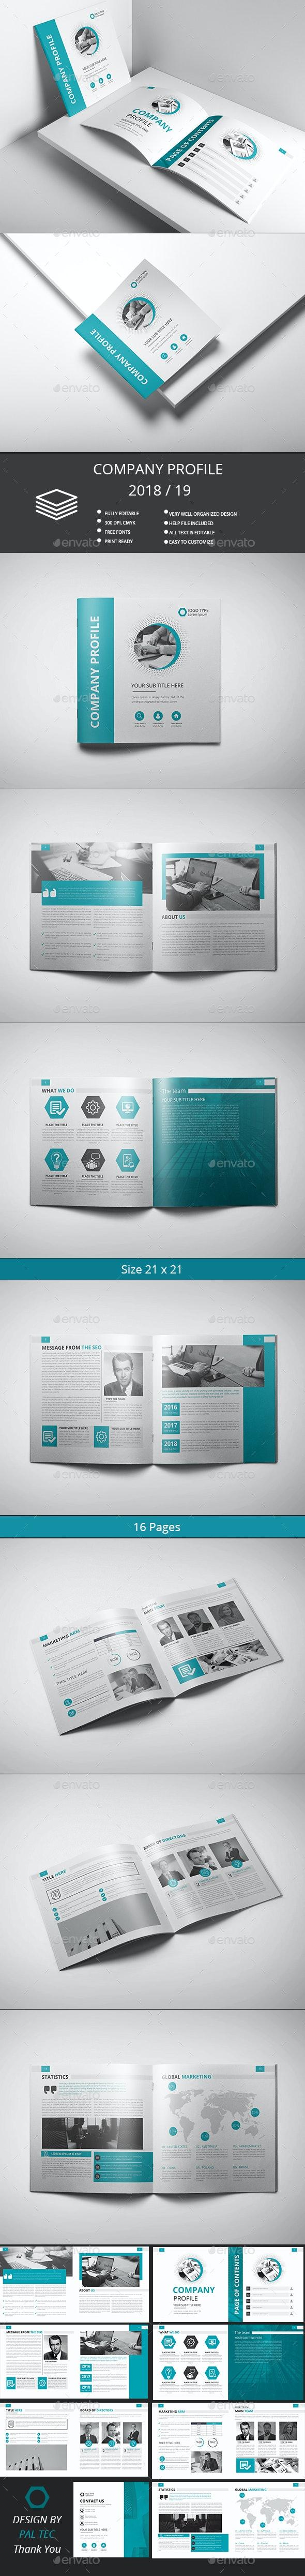 Company Profile - Brochures Print Templates